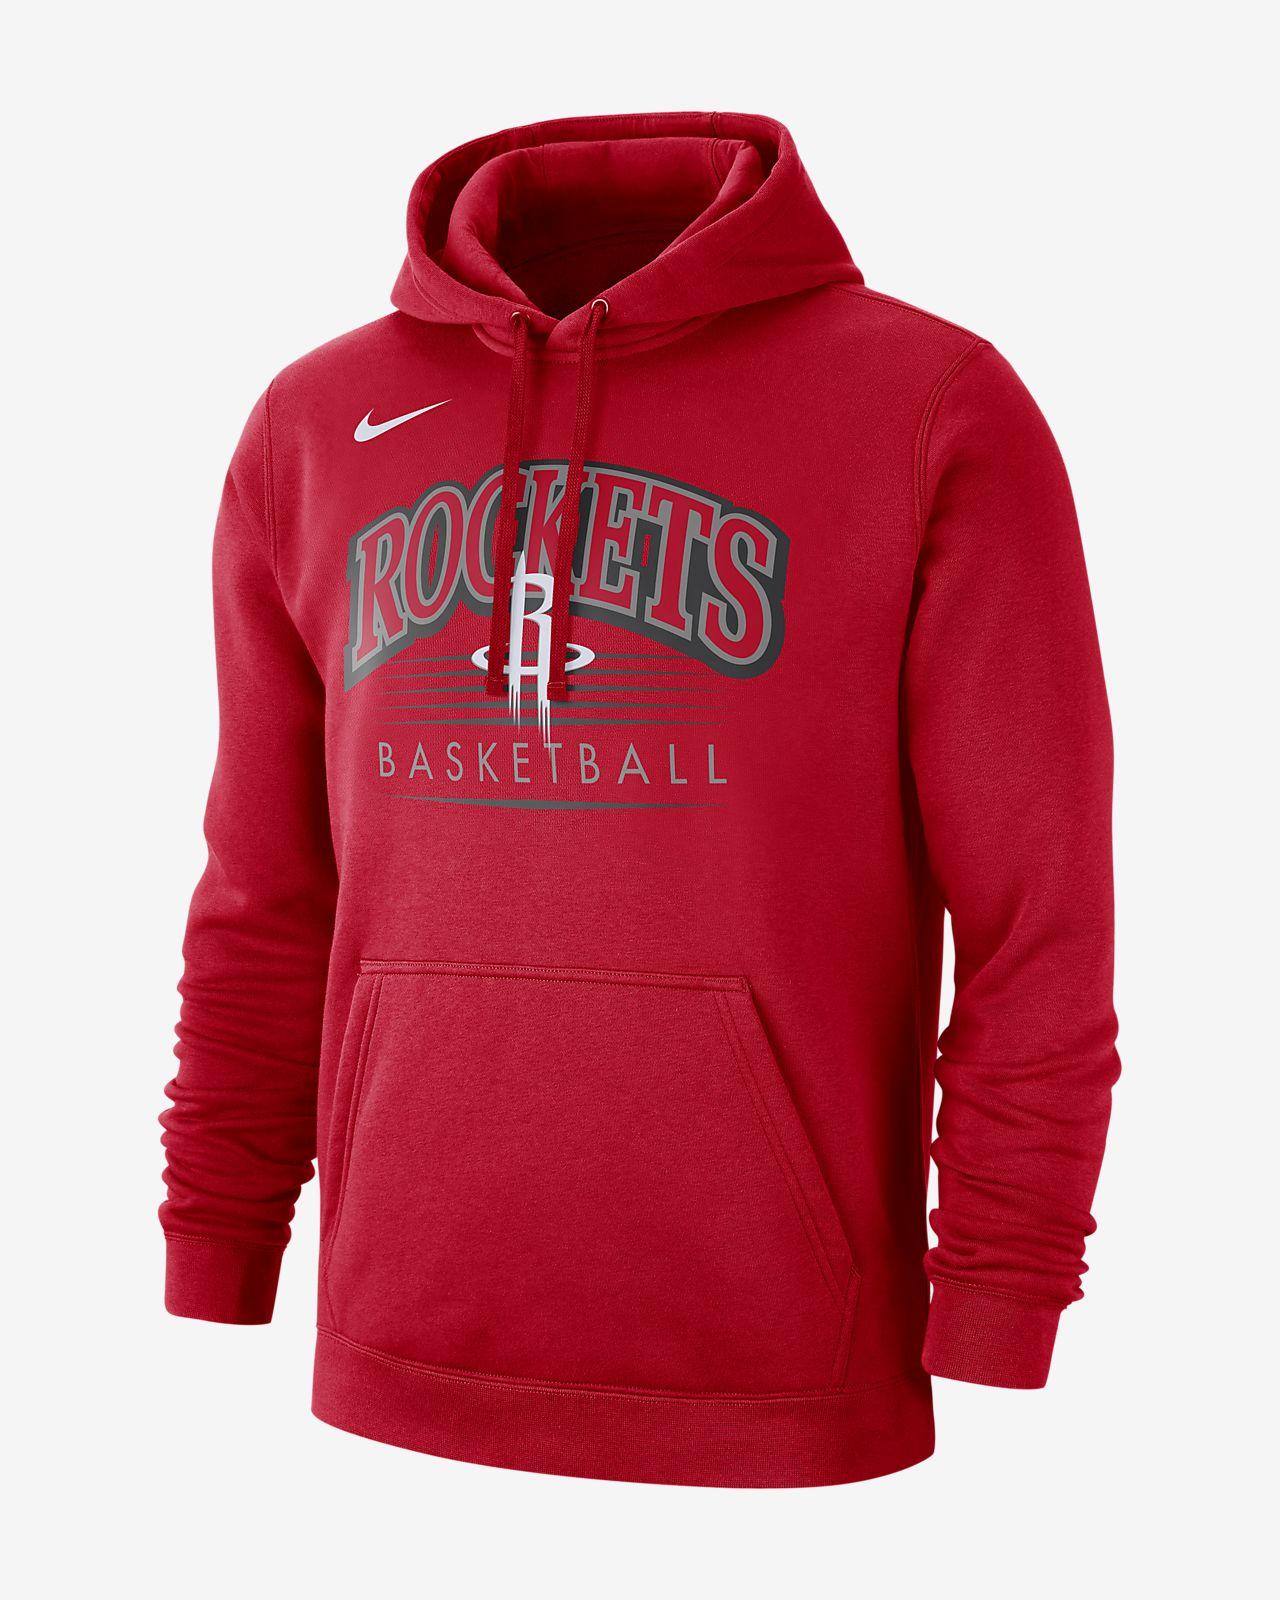 79f758d60dde Ανδρική μπλούζα με κουκούλα NBA Houston Rockets Nike. Nike.com GR